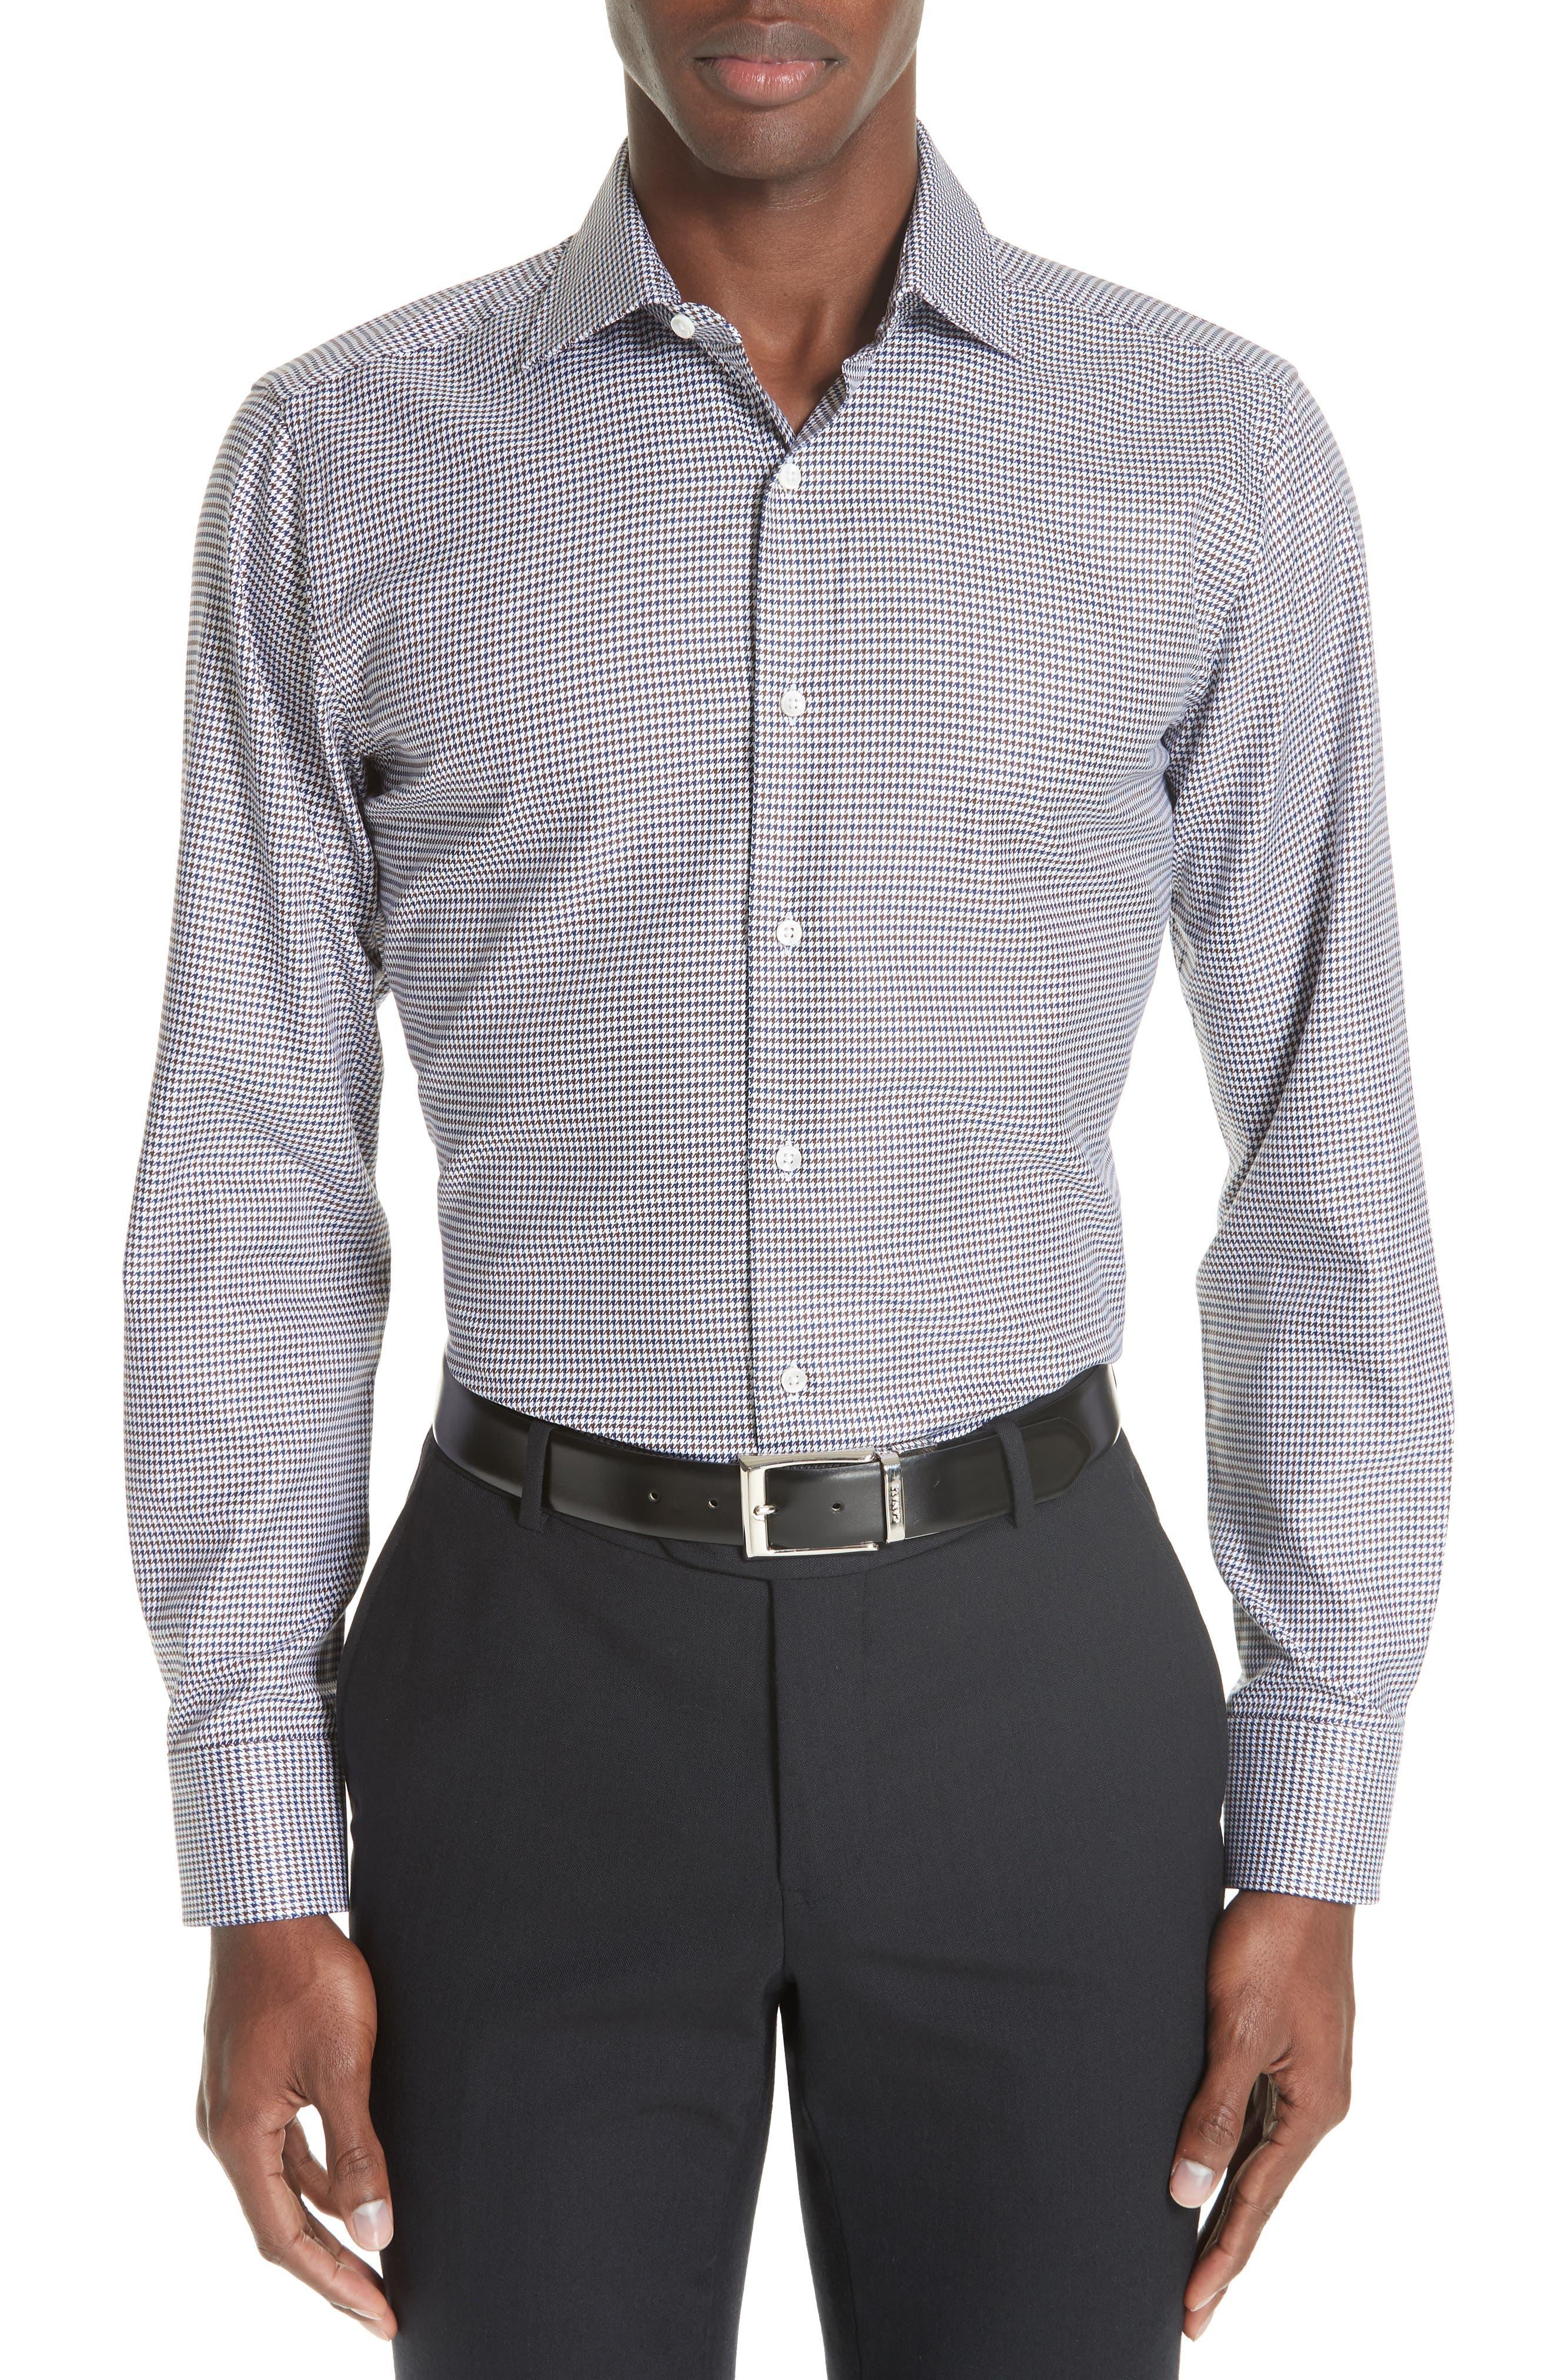 Regular Fit Houndstooth Dress Shirt,                         Main,                         color, NAVY/ BROWN